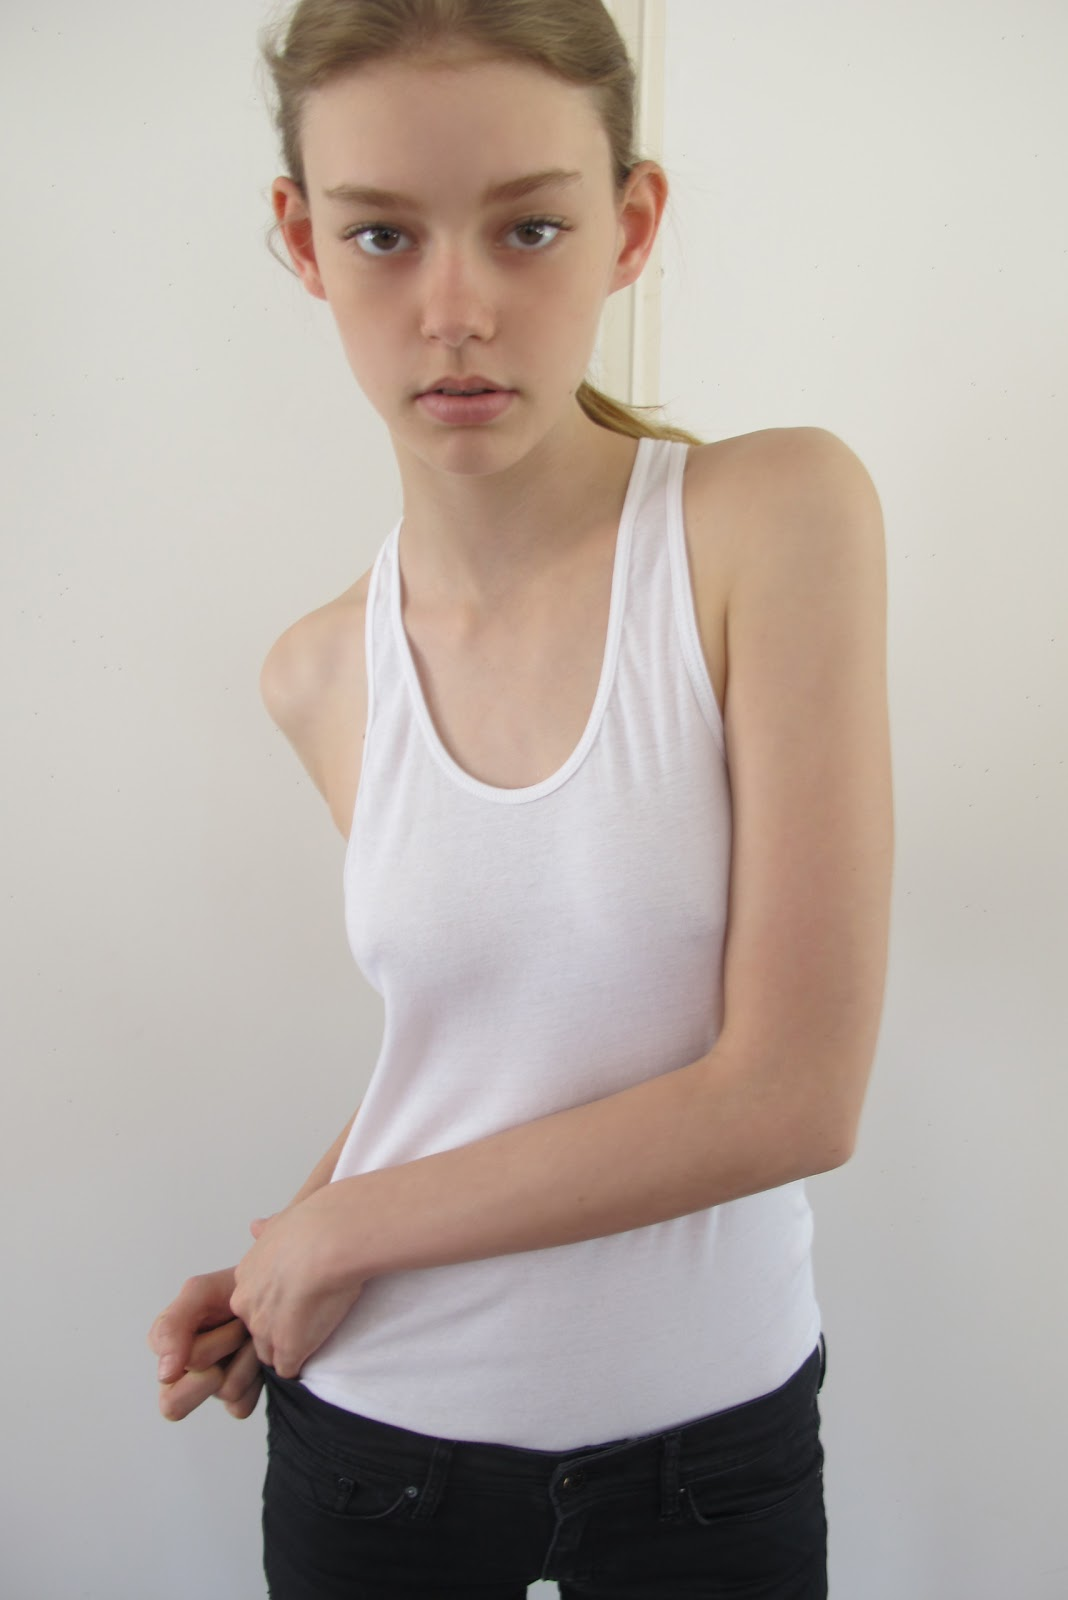 Advertisement hot arab teen body